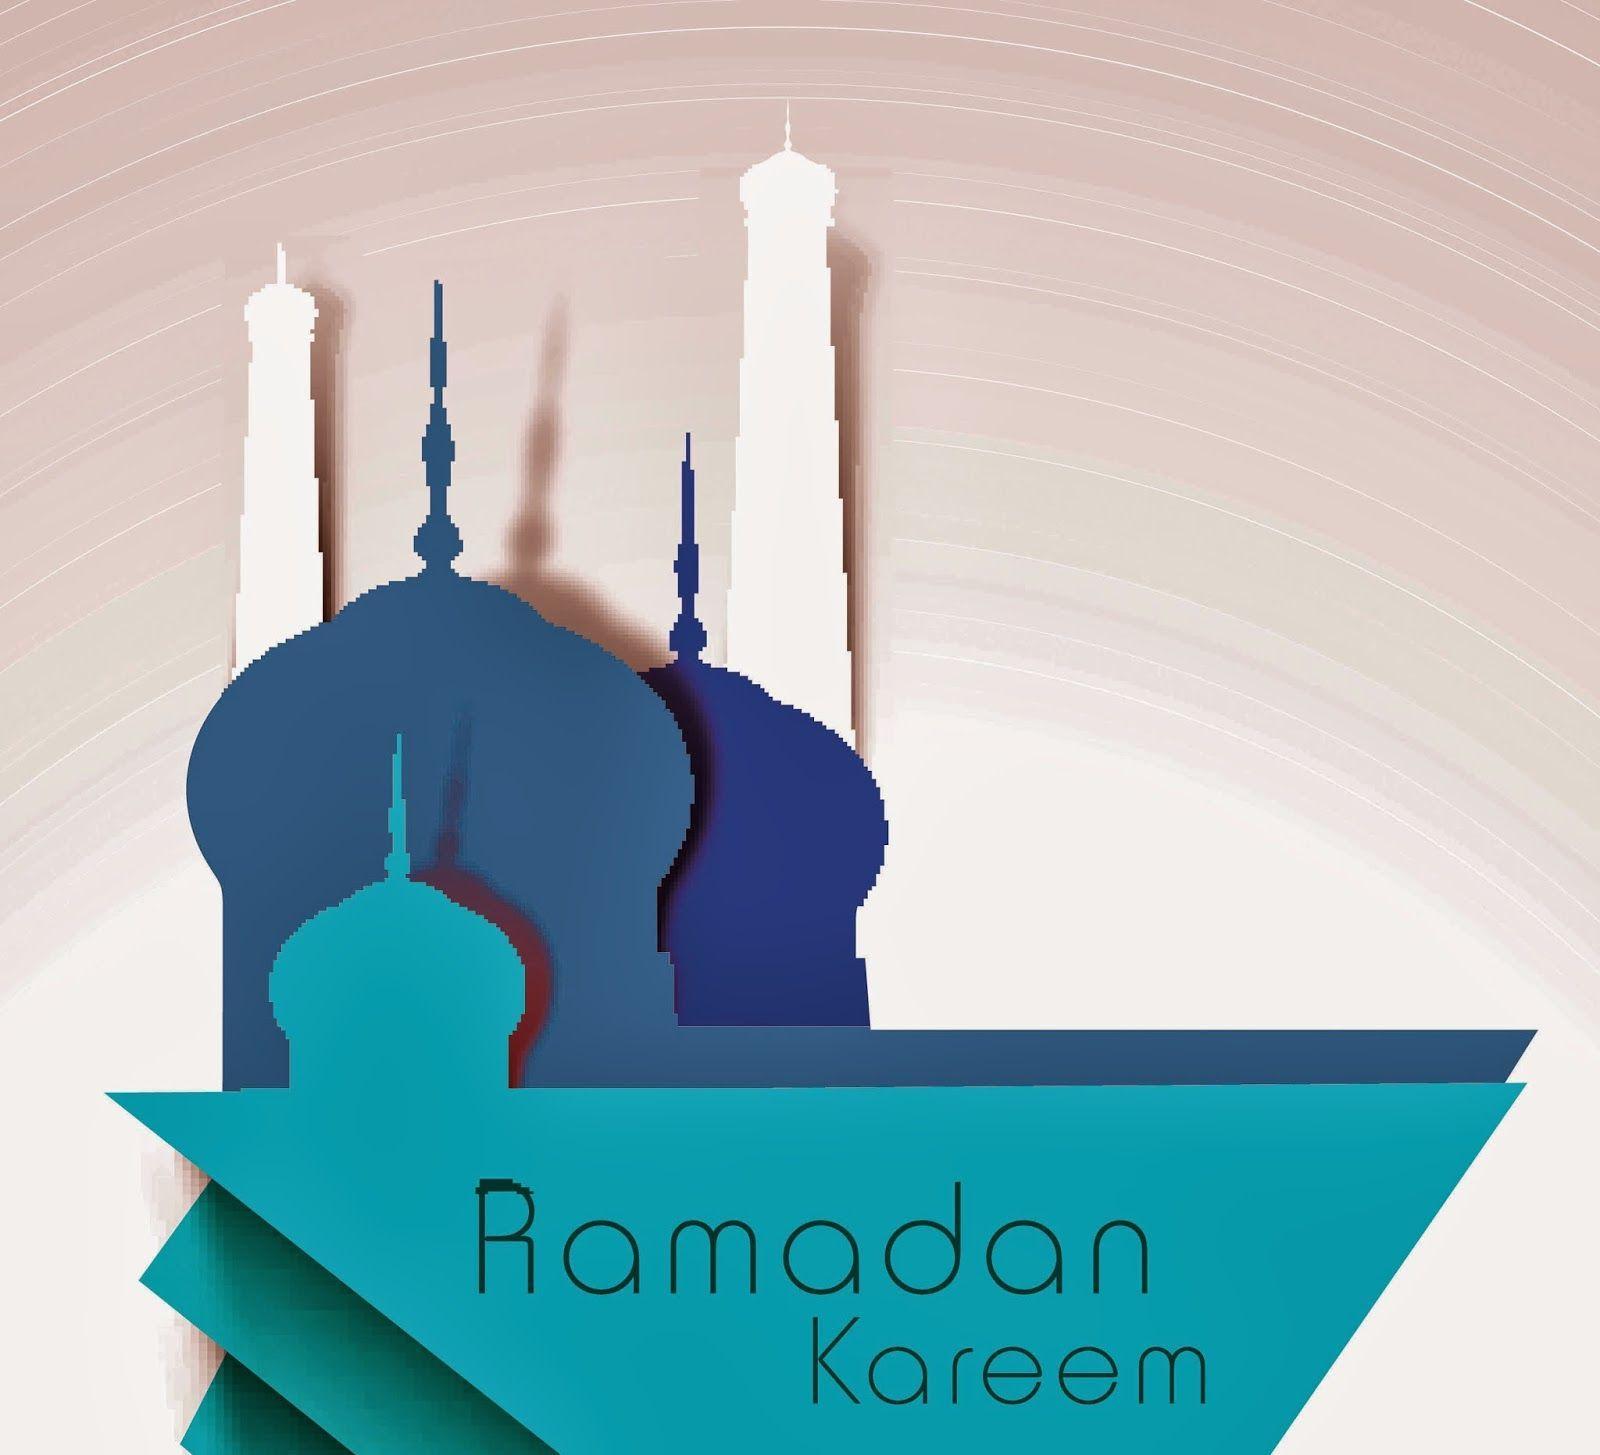 Ramadhan Frame Design